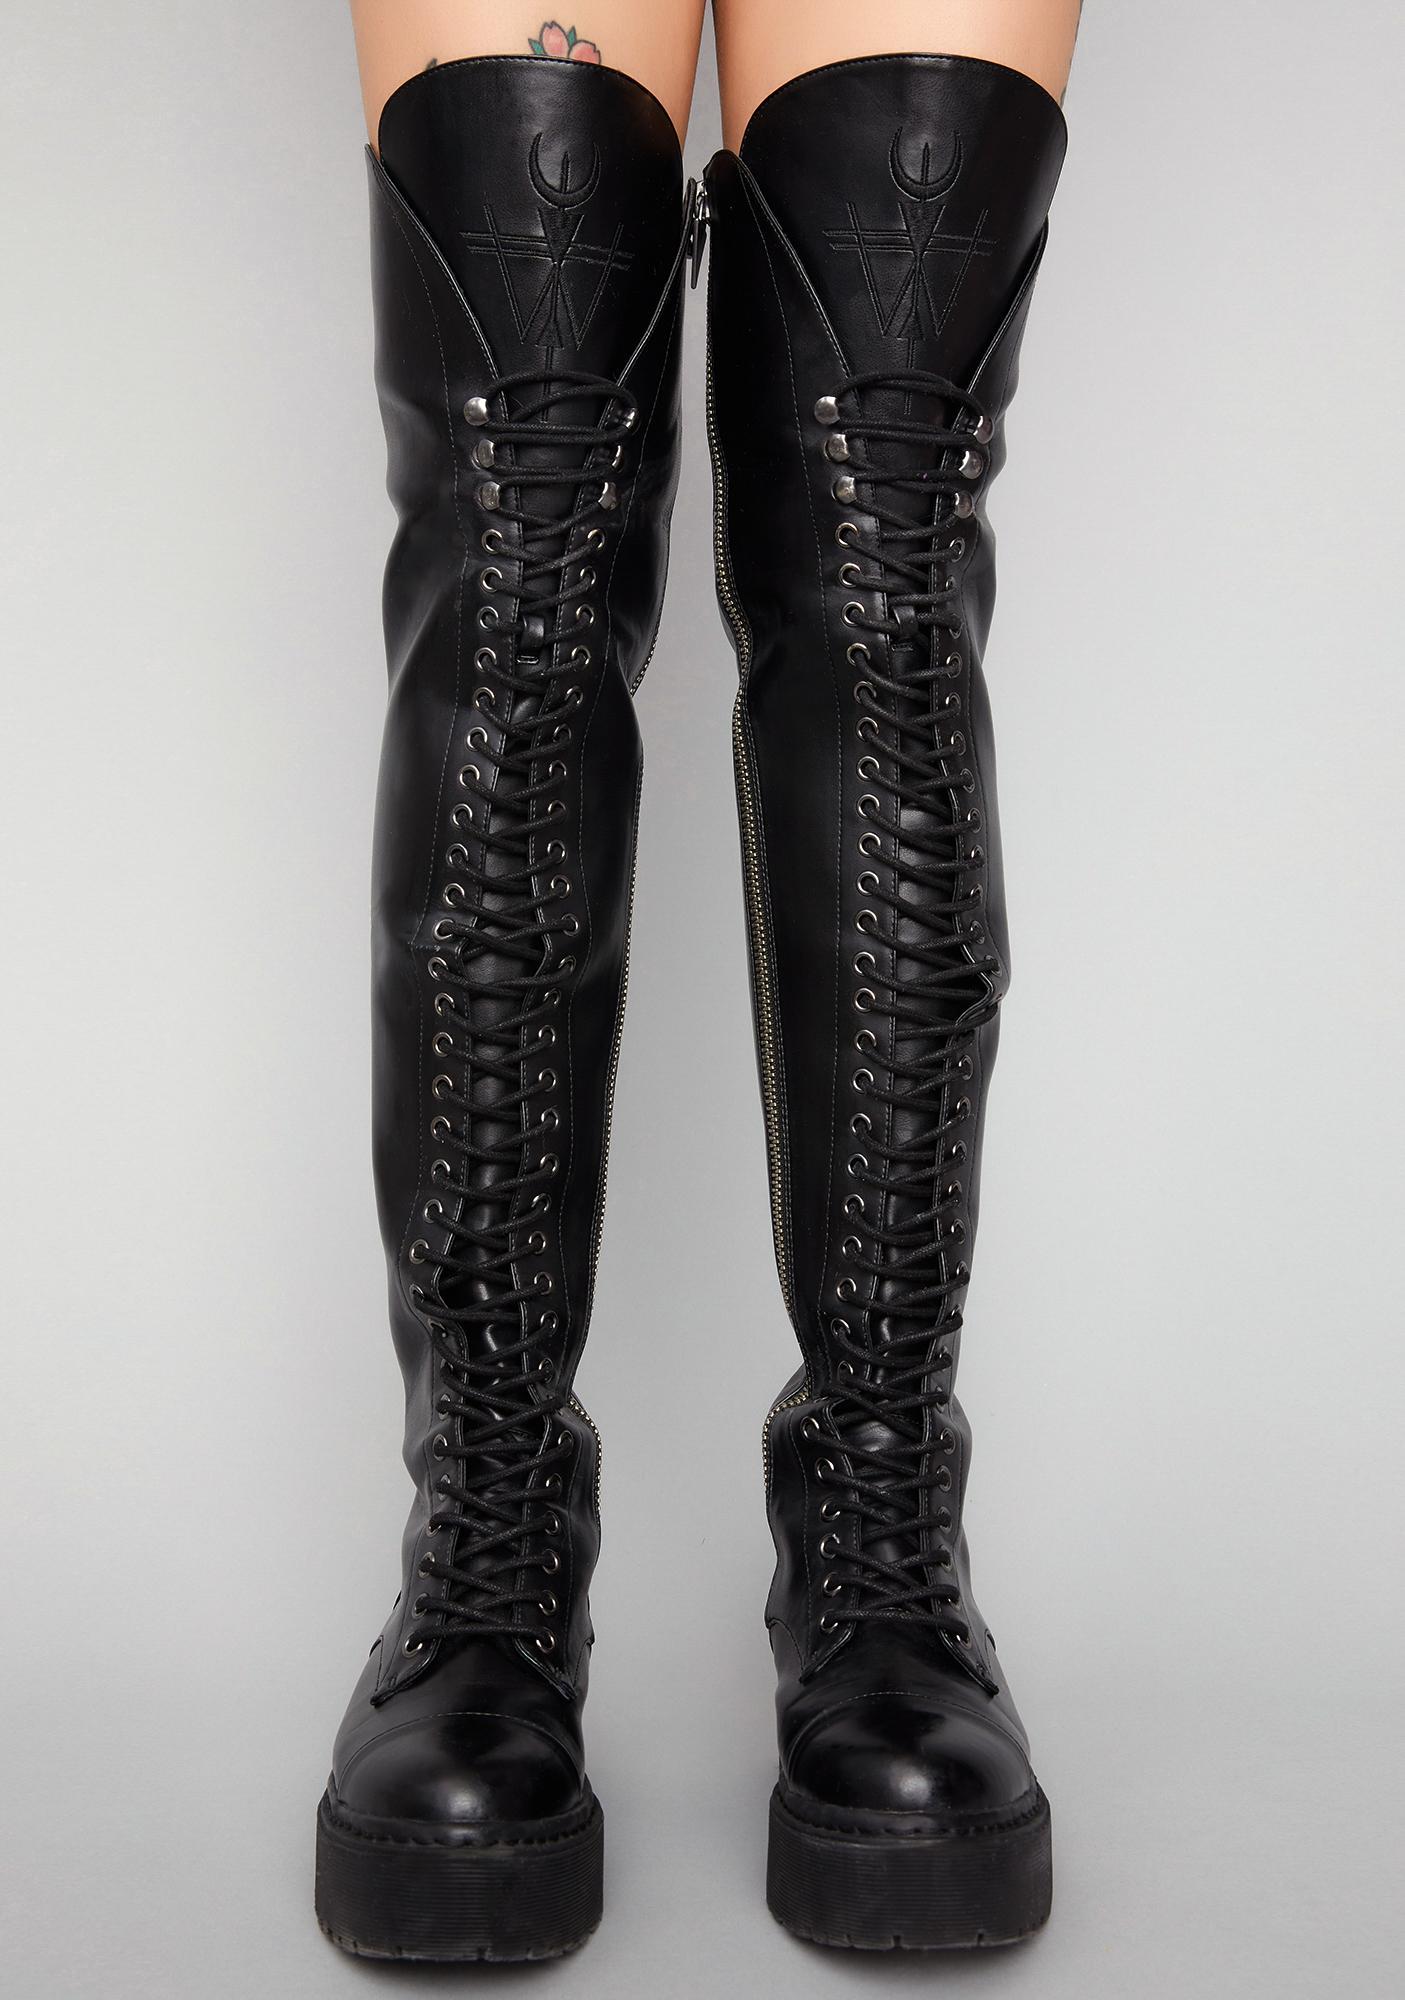 baf6af2cdc3a Widow Memento Mori Thigh High Boots